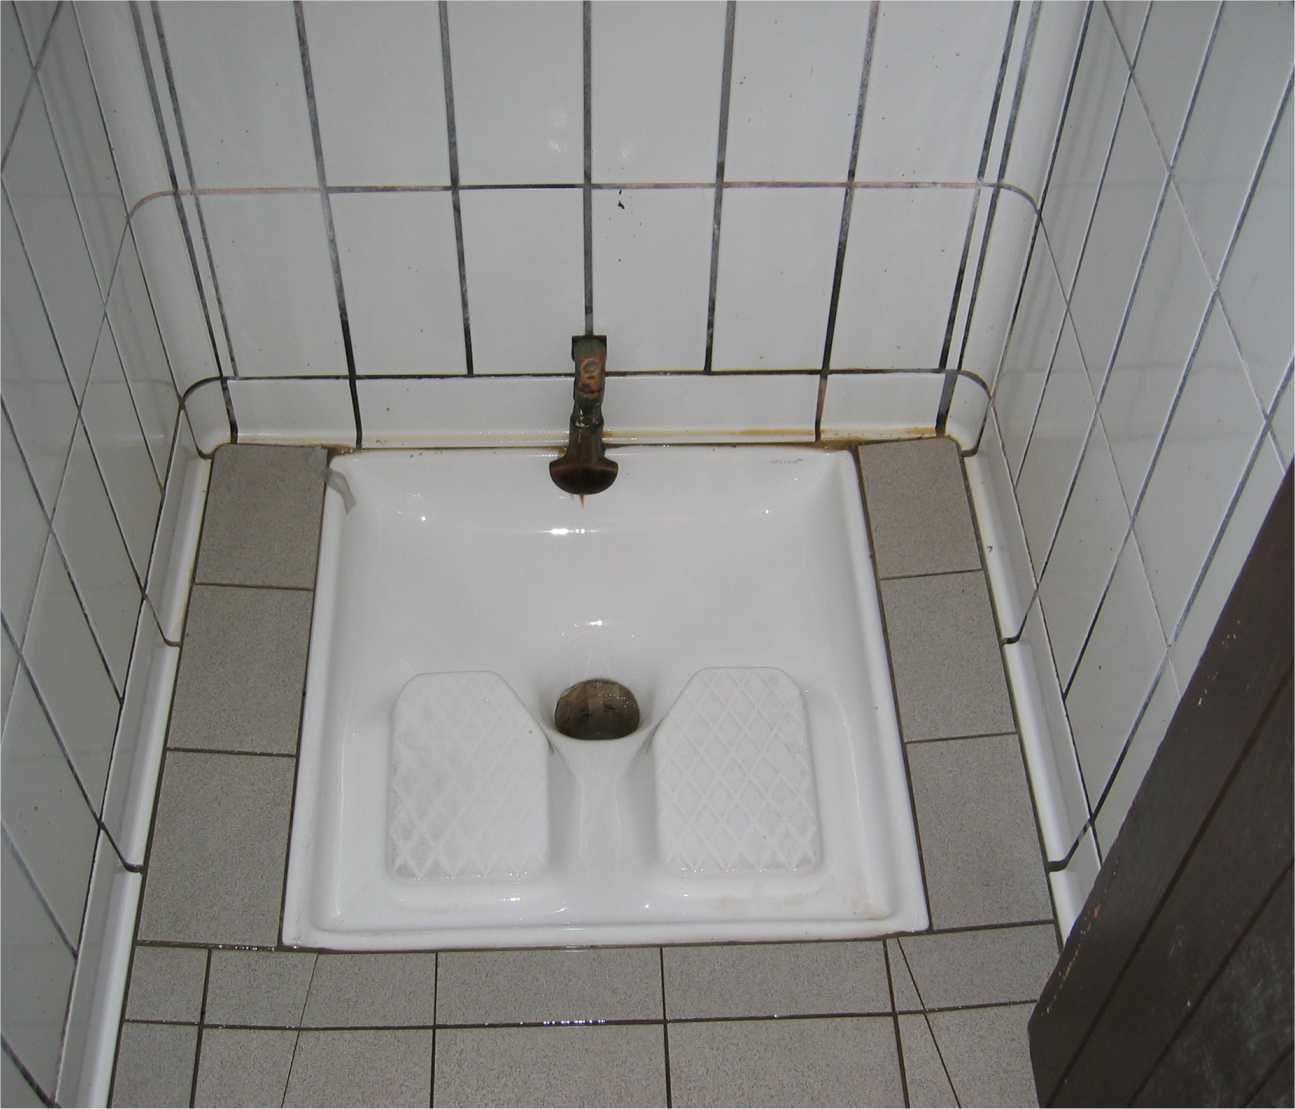 Image of a Turkish Toilet (Wikipedia)